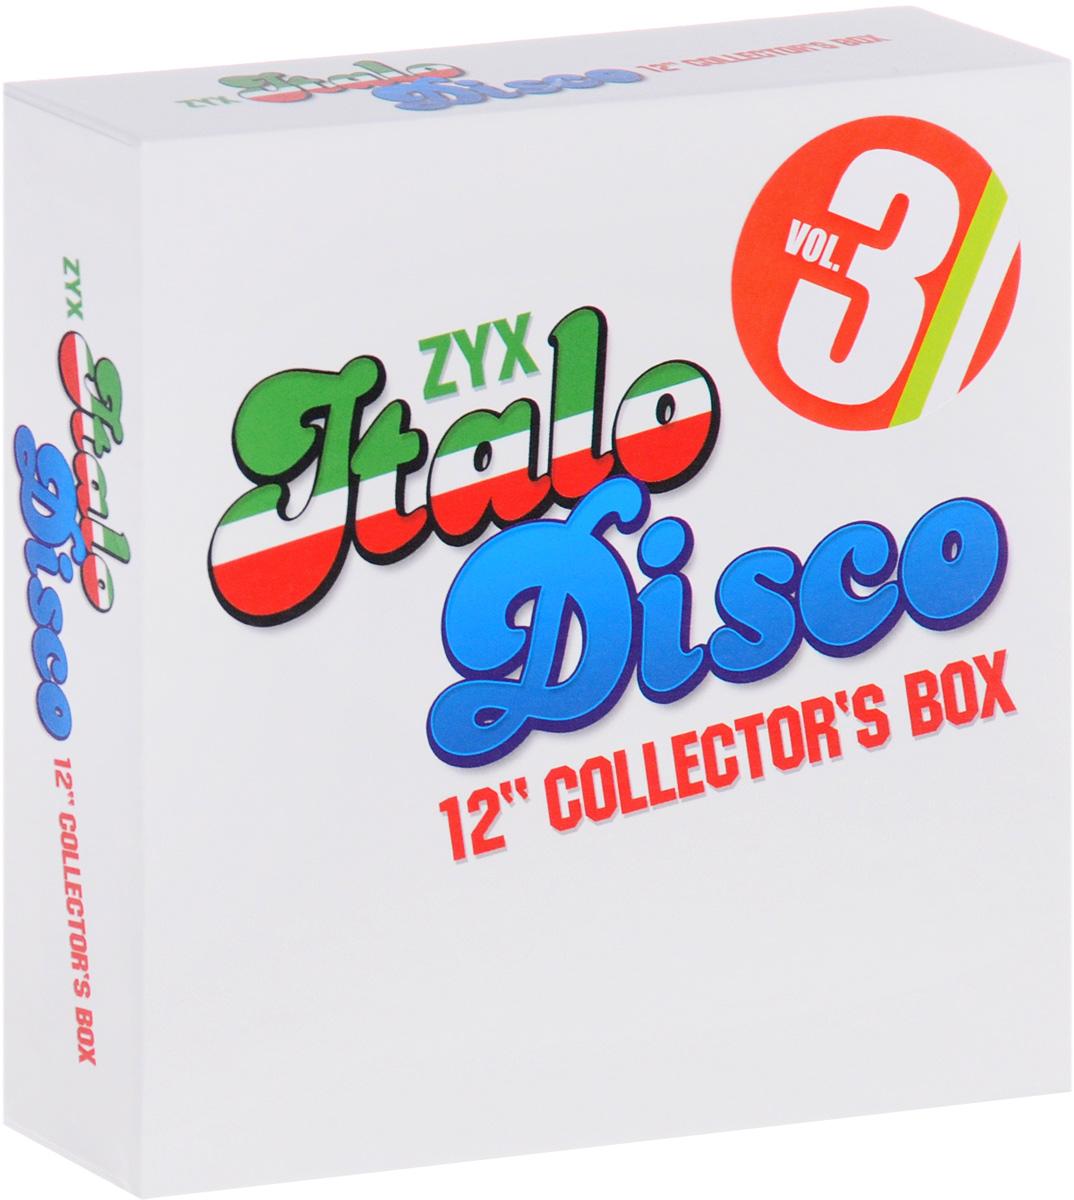 "Грант Миллер,Валери Доре,""Savage"",Tango,Алан Росс,Koto,""50 & 50 Brothers"",Brando,Сильвер Поццоли,Майк Мэрин ZYX Italo Disco. 12"" Collector's Box. Vol. 3 (10 CD)"